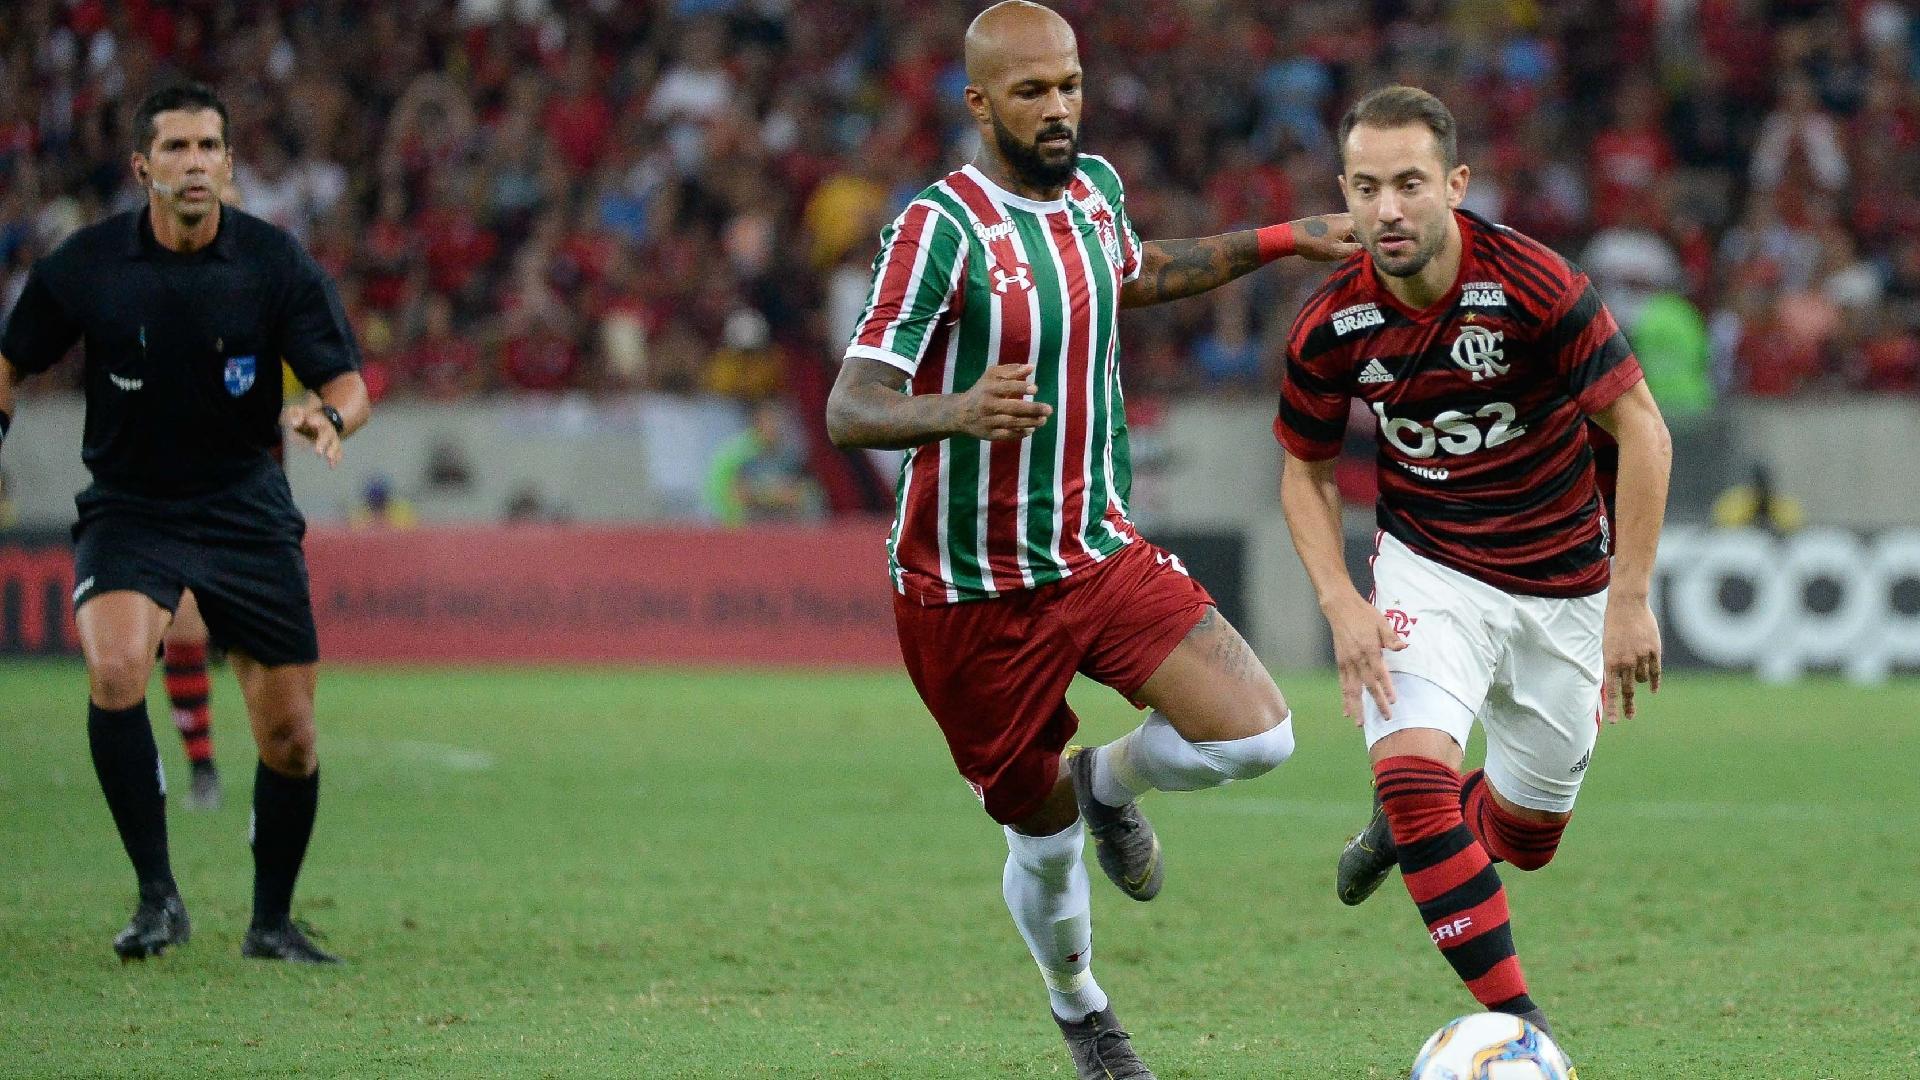 Bruno Silva Everton Ribeiro Fluminense Flamengo Campeonato Carioca